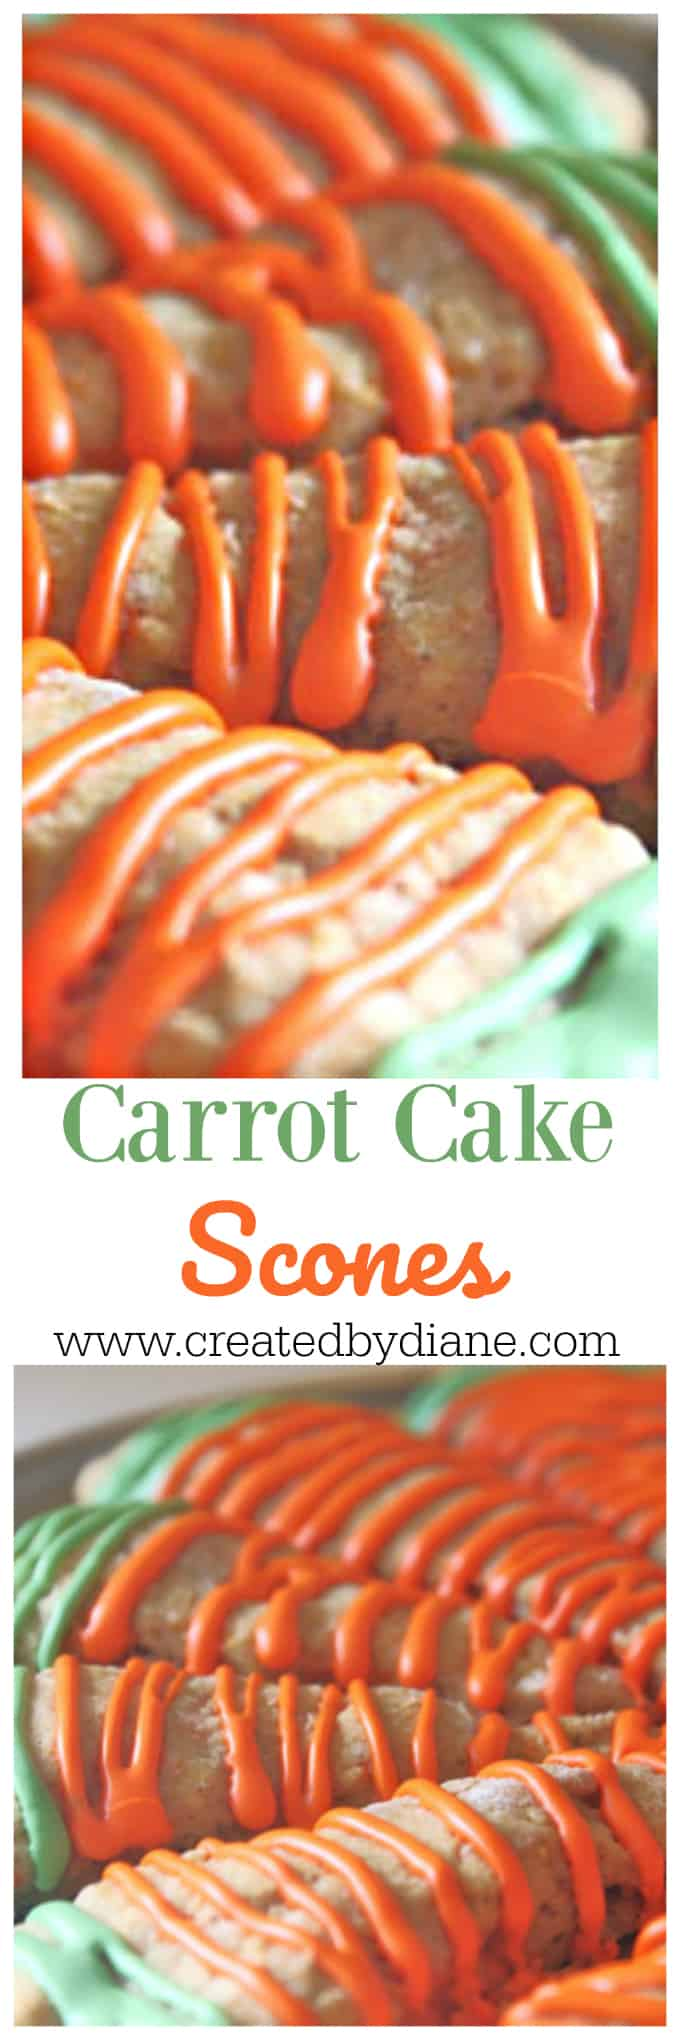 carrot cake scones www.createdbydiane.com